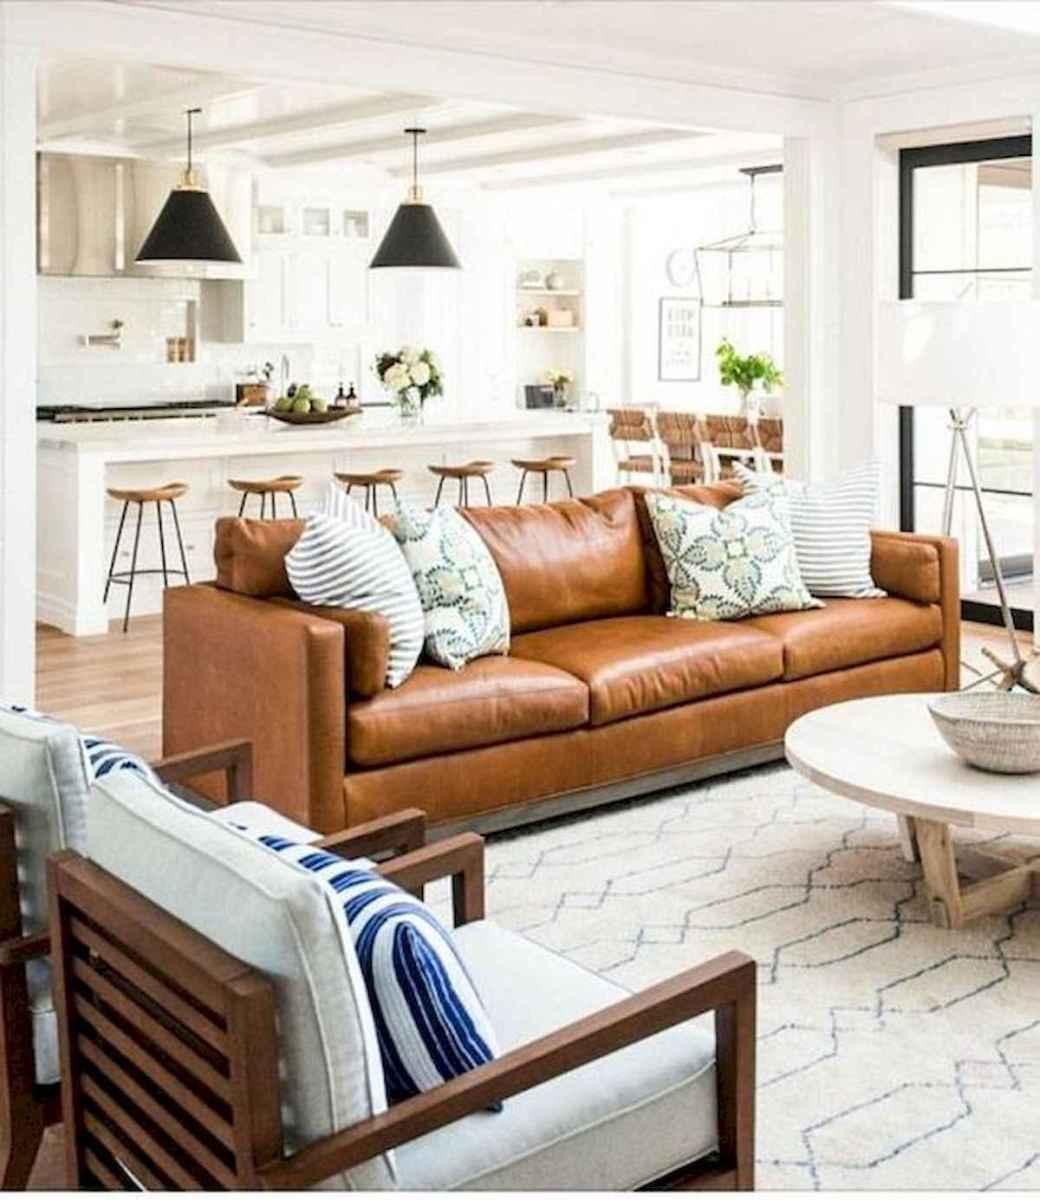 40+ Beautiful Studio Apartment Kitchen Decor Ideas And Remodel (41)